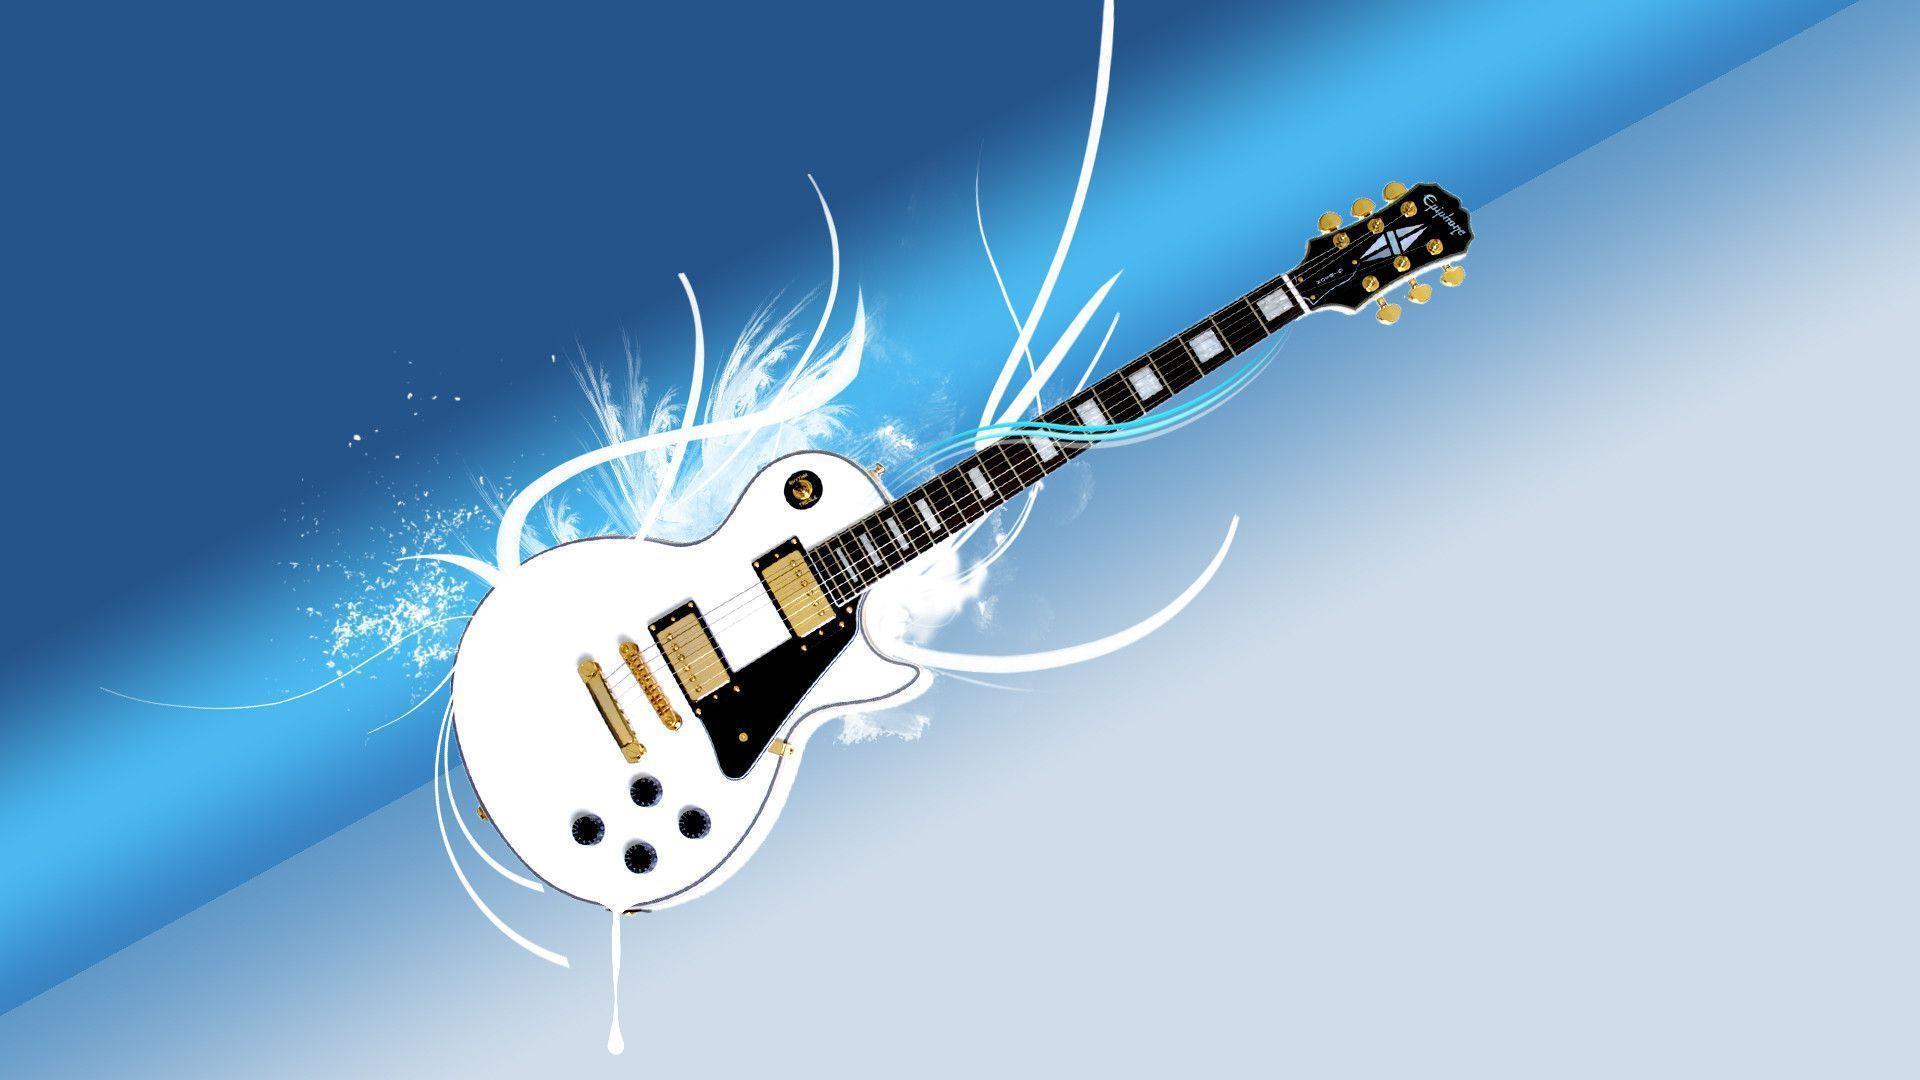 guitar wallpaper widescreen - photo #23